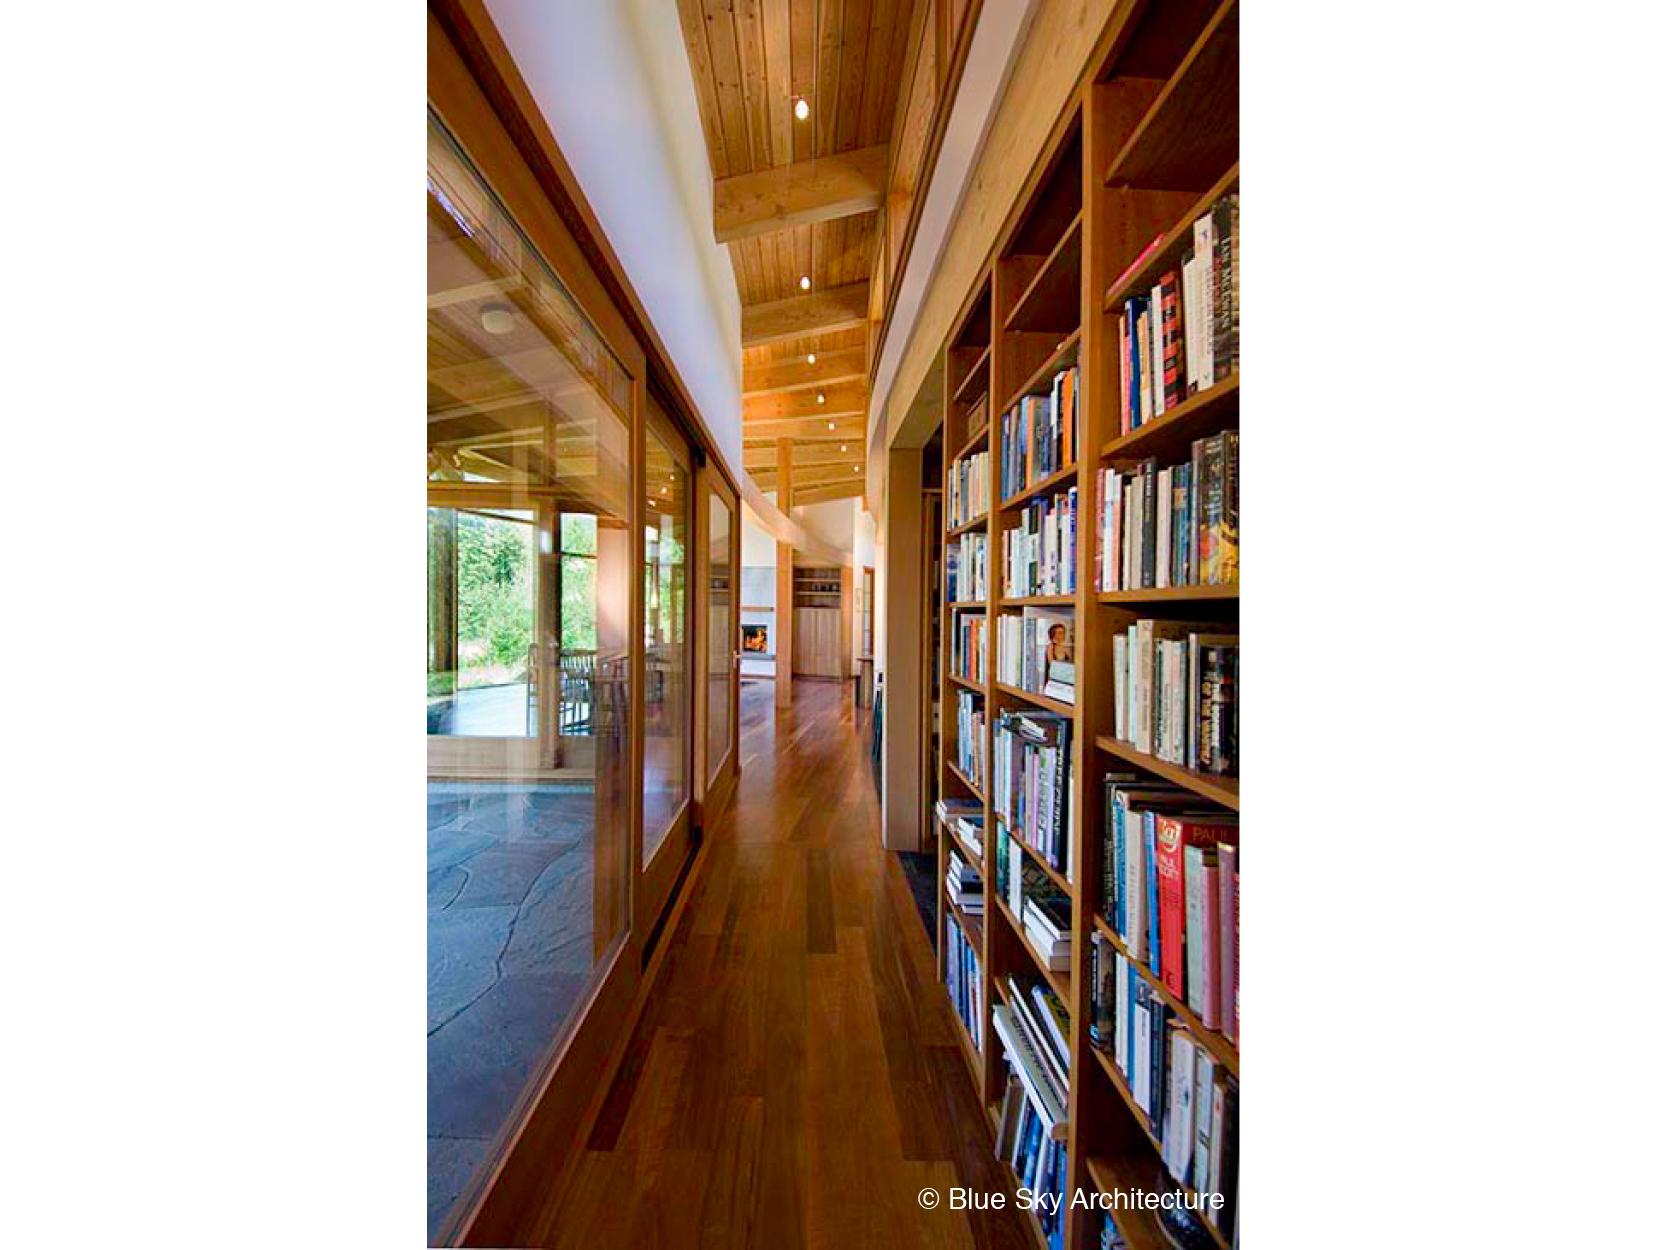 HollyFarm-house-hallway-bookshelves-wood-window.jpg